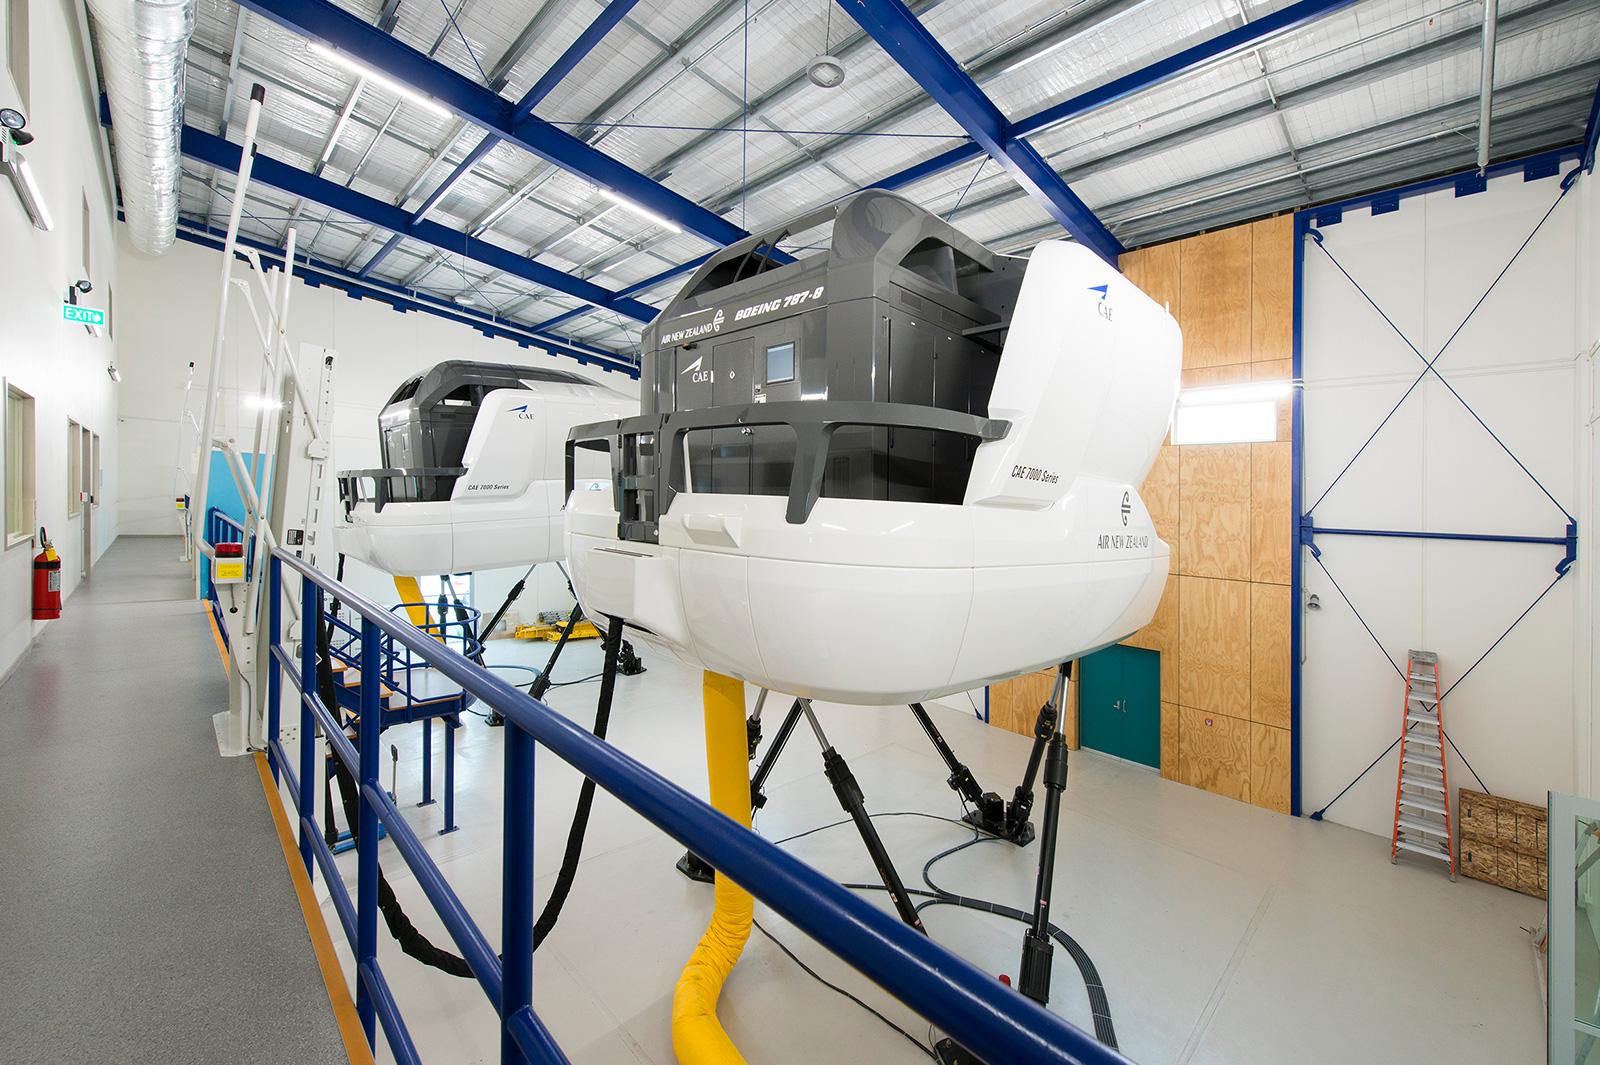 Construction-Company-Aspec-Air-NZ-Flight-Simulator-6